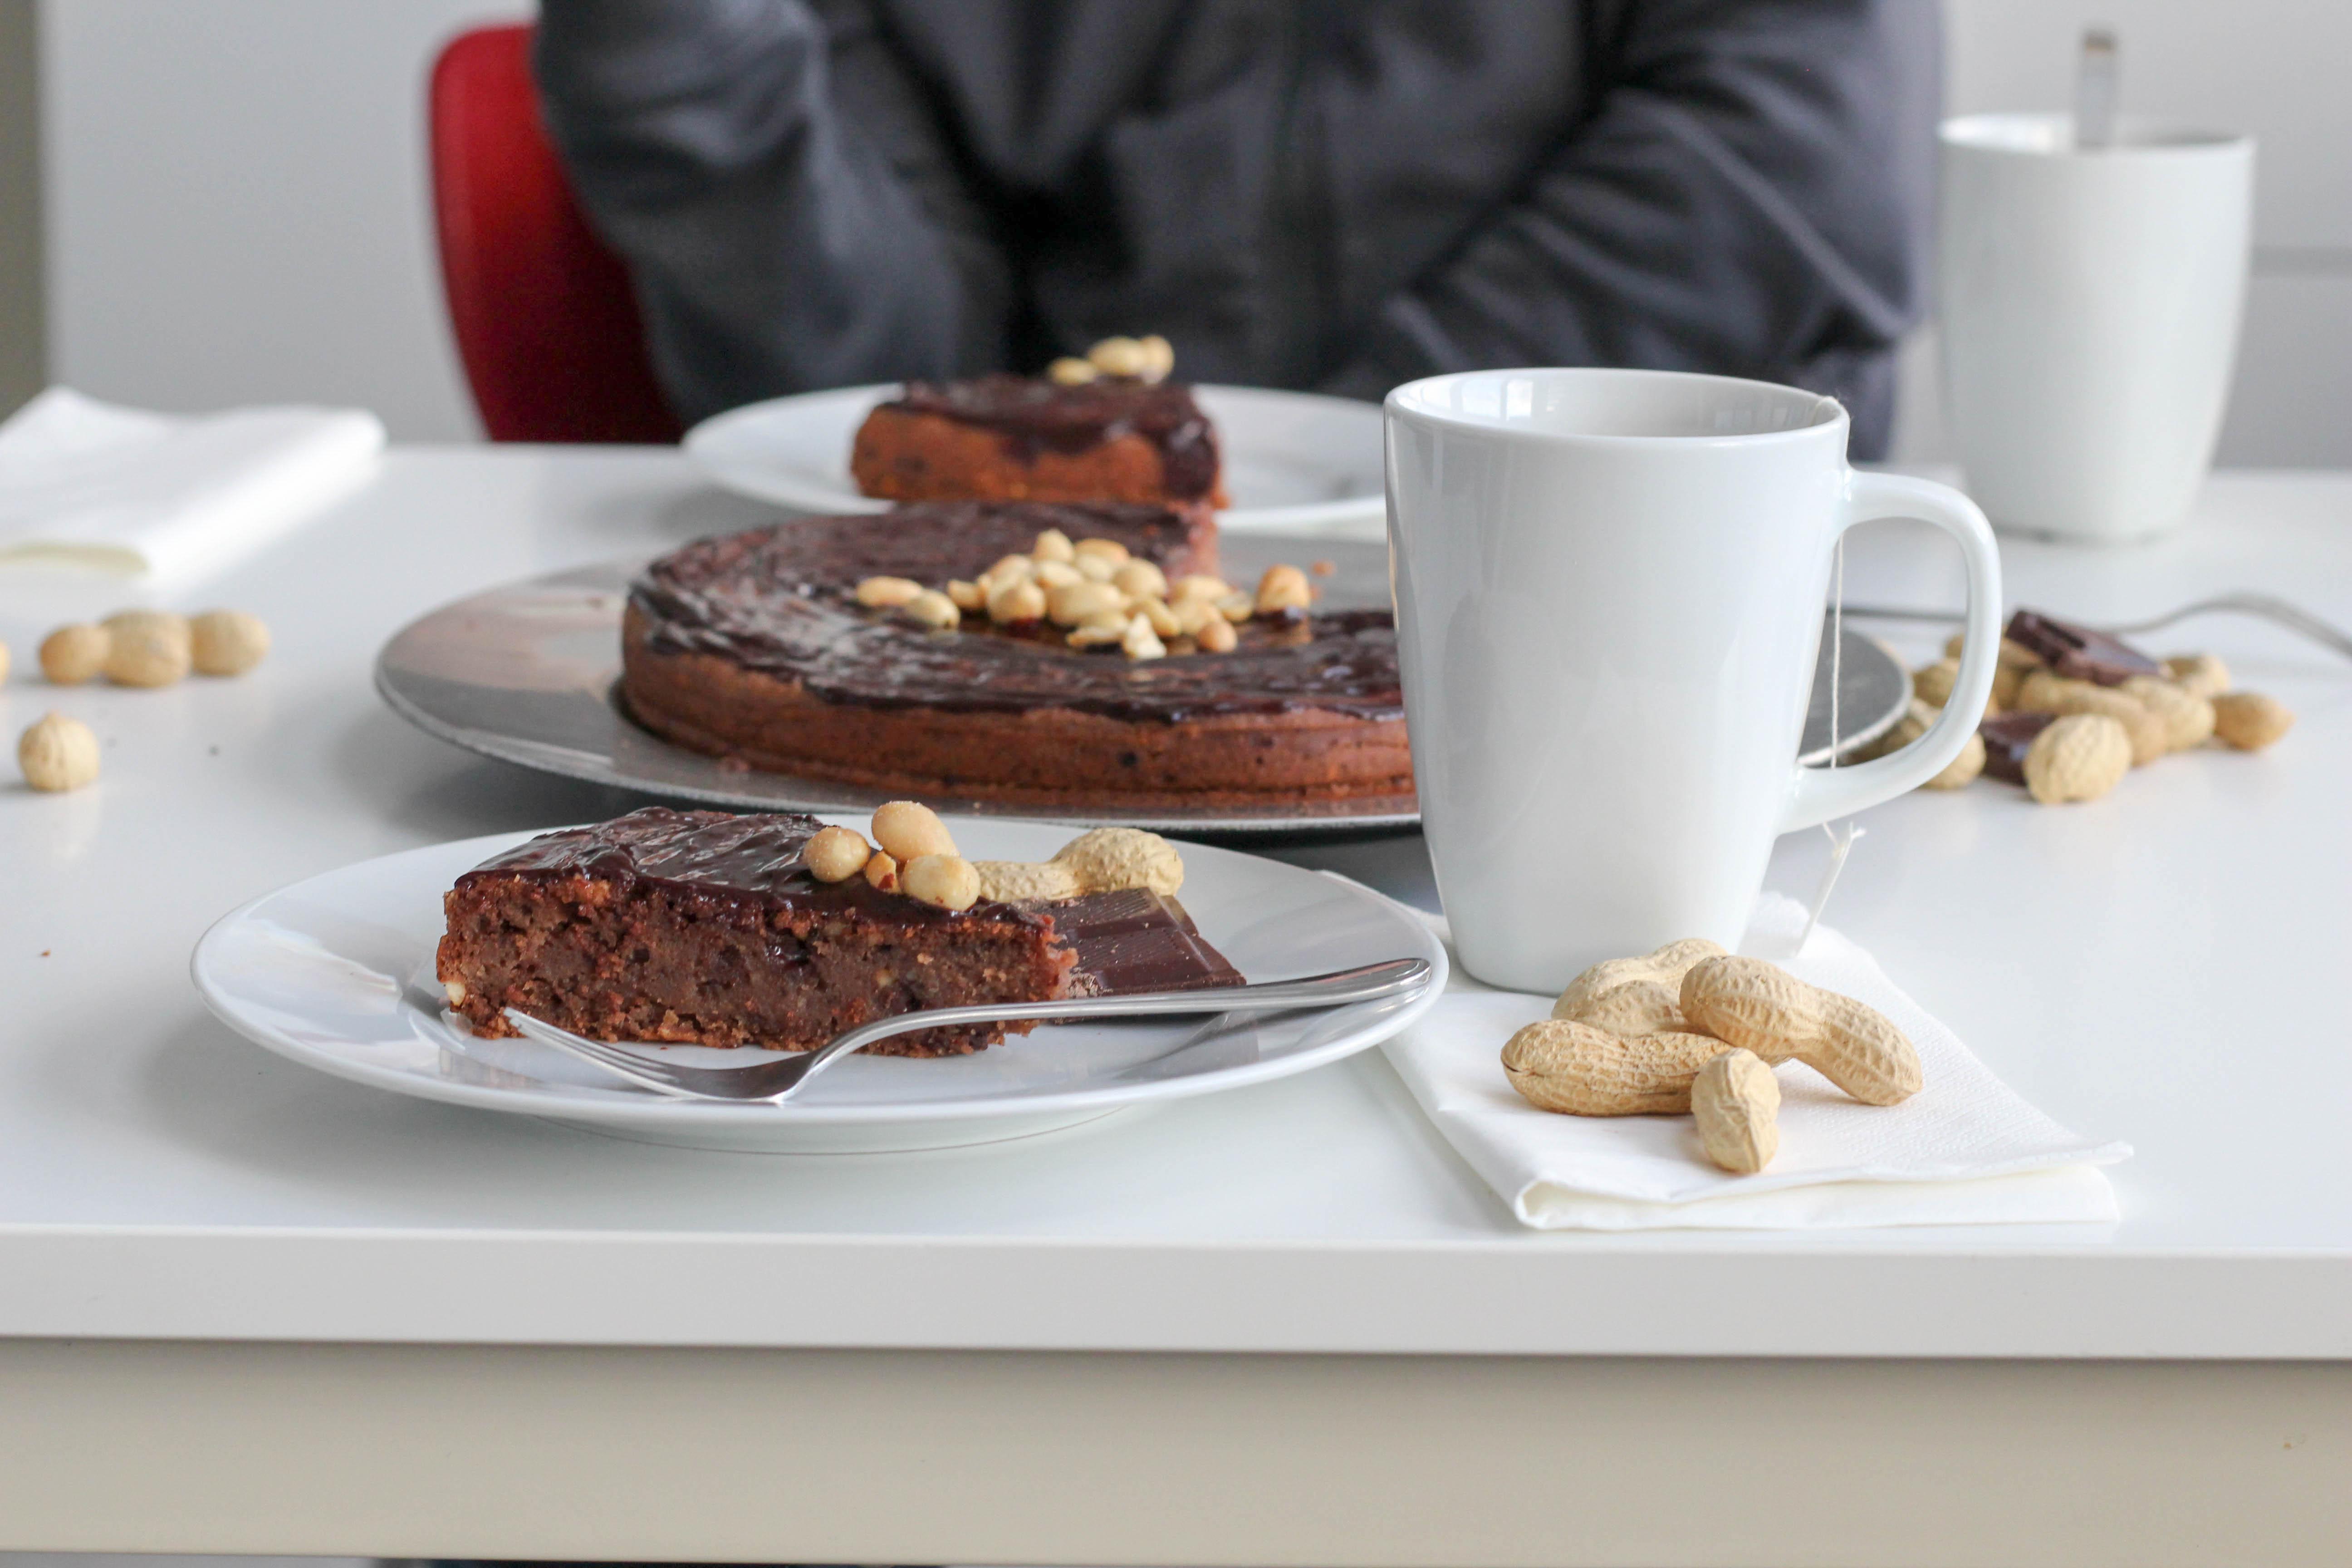 vegan-erdnusskuchen-schokolade-soulfood-homespa-plantbased